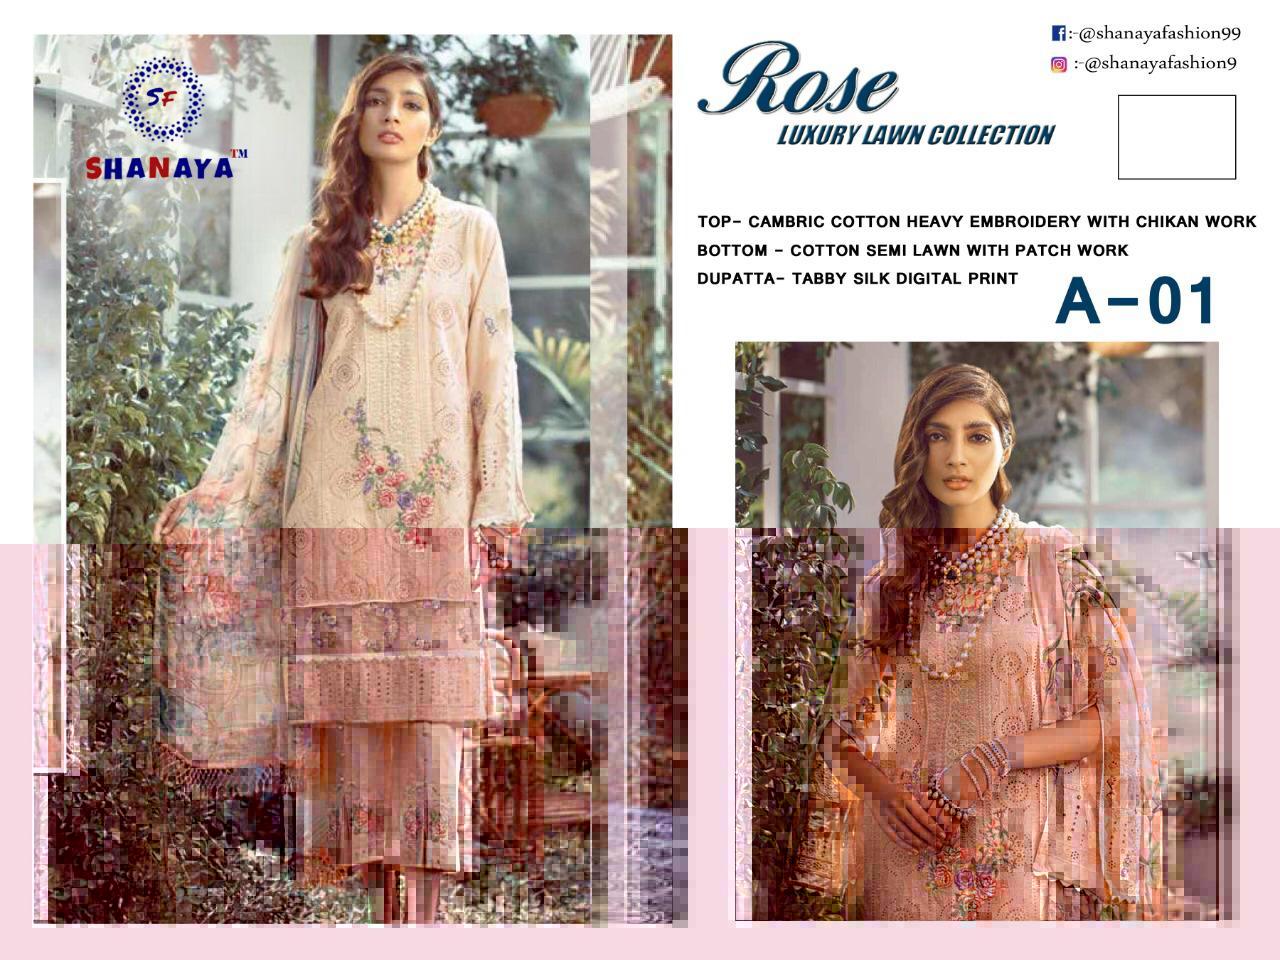 Shanaya Fashion Rose A-01 Designer Heavy Cotton With Chicken Work Suits In Singles